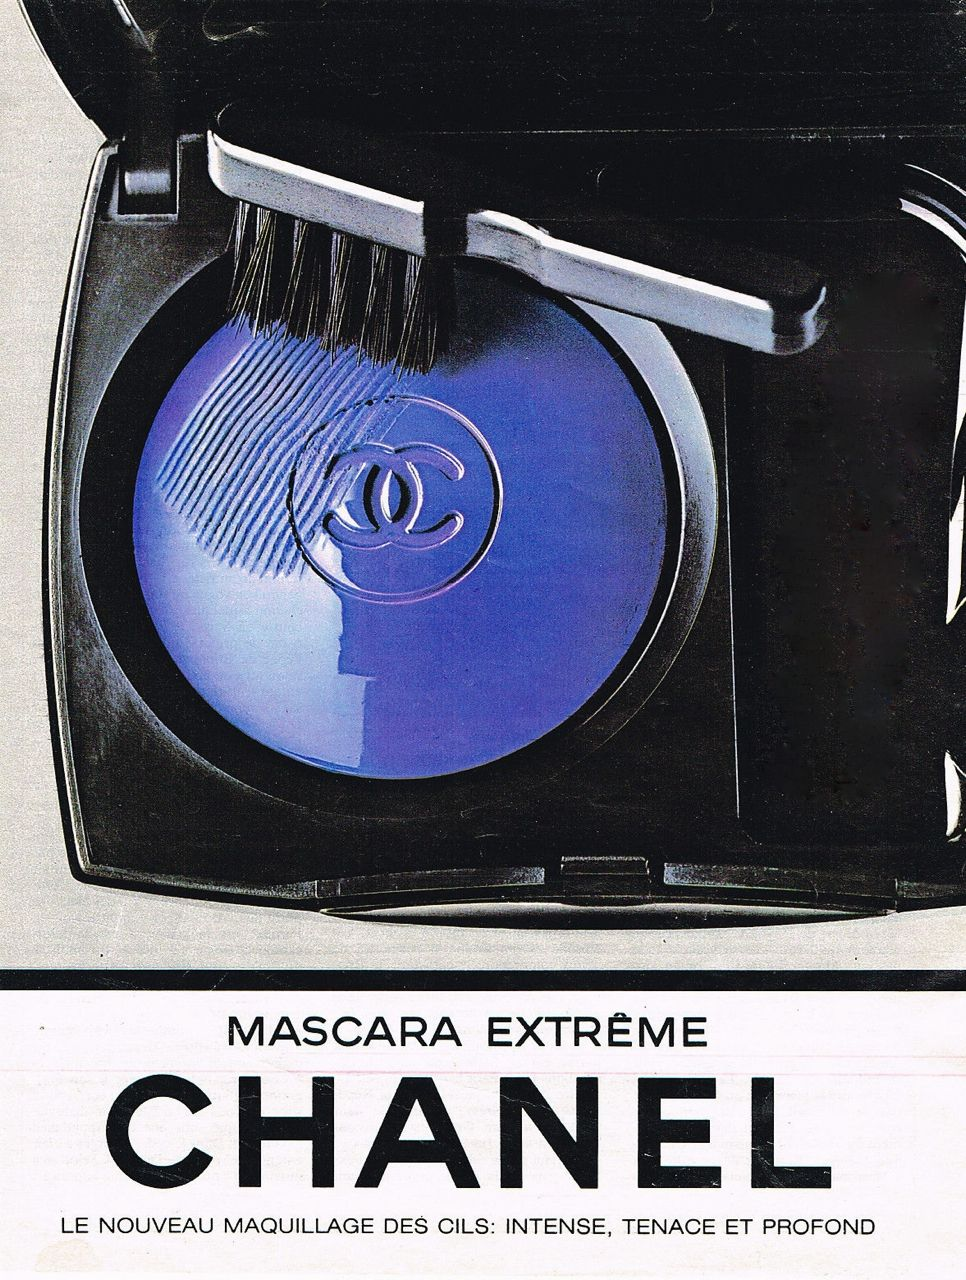 Chanel Mascara Ad, 1984